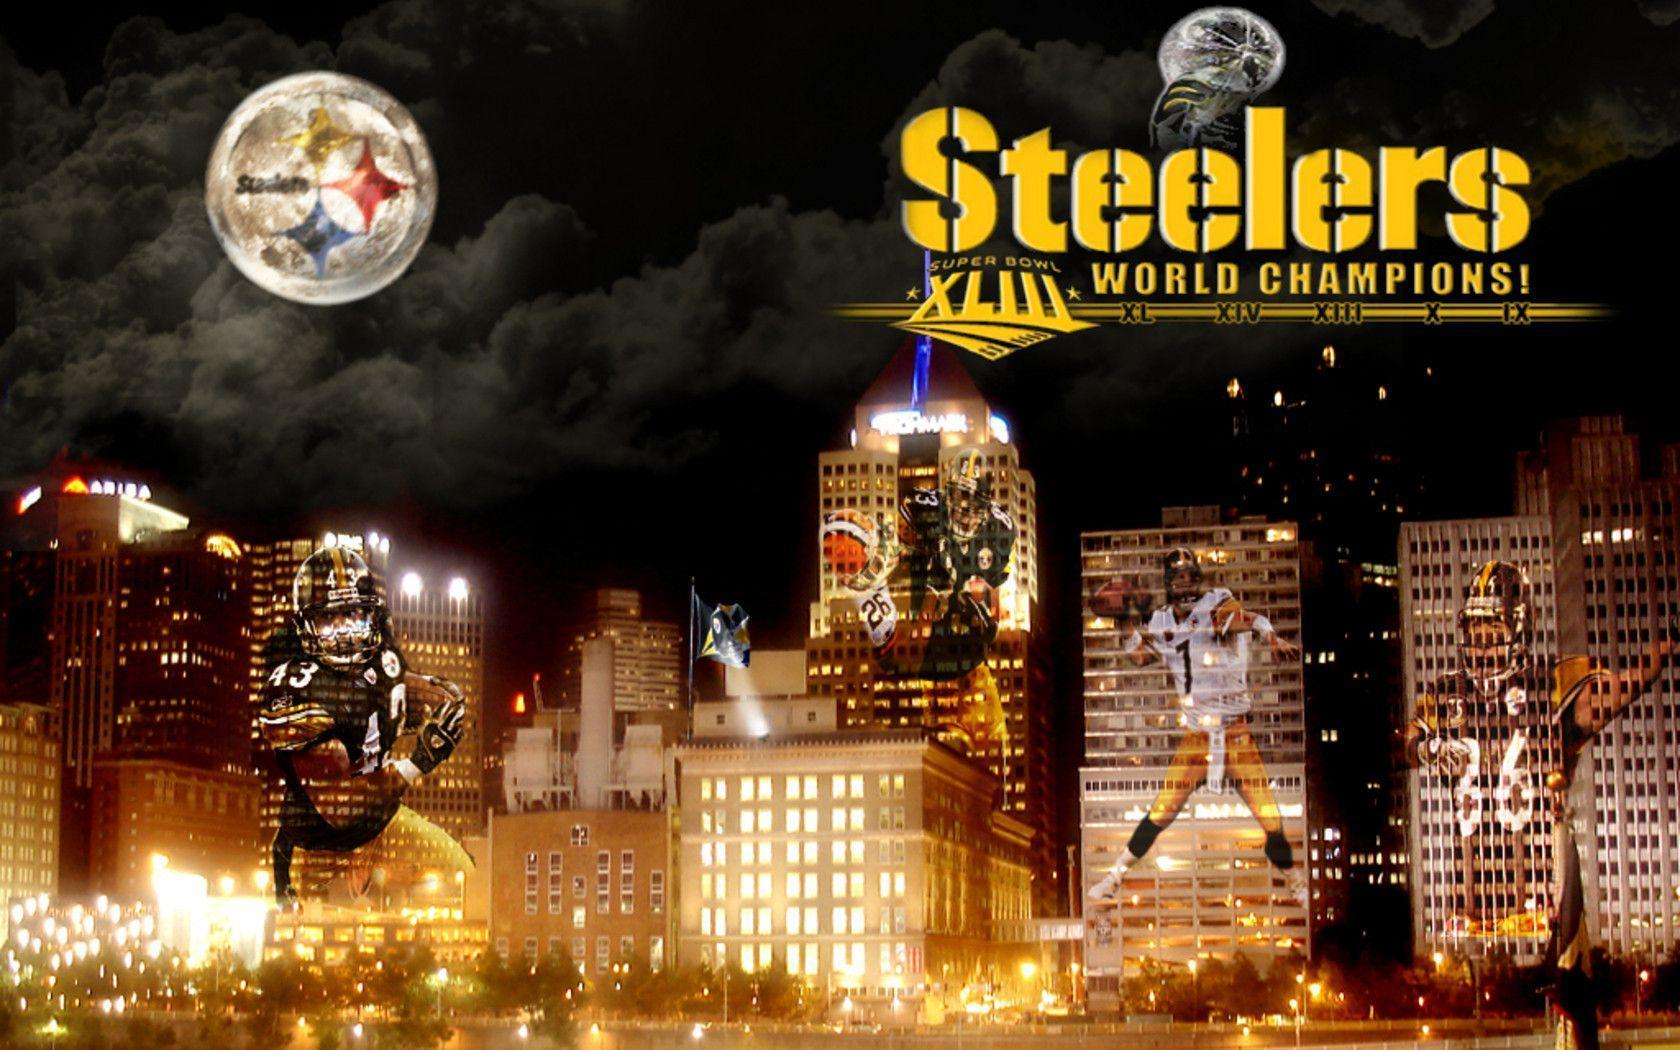 Pittsburgh Steelers Wallpapers - Wallpapers Insider | Free HD 4K ...